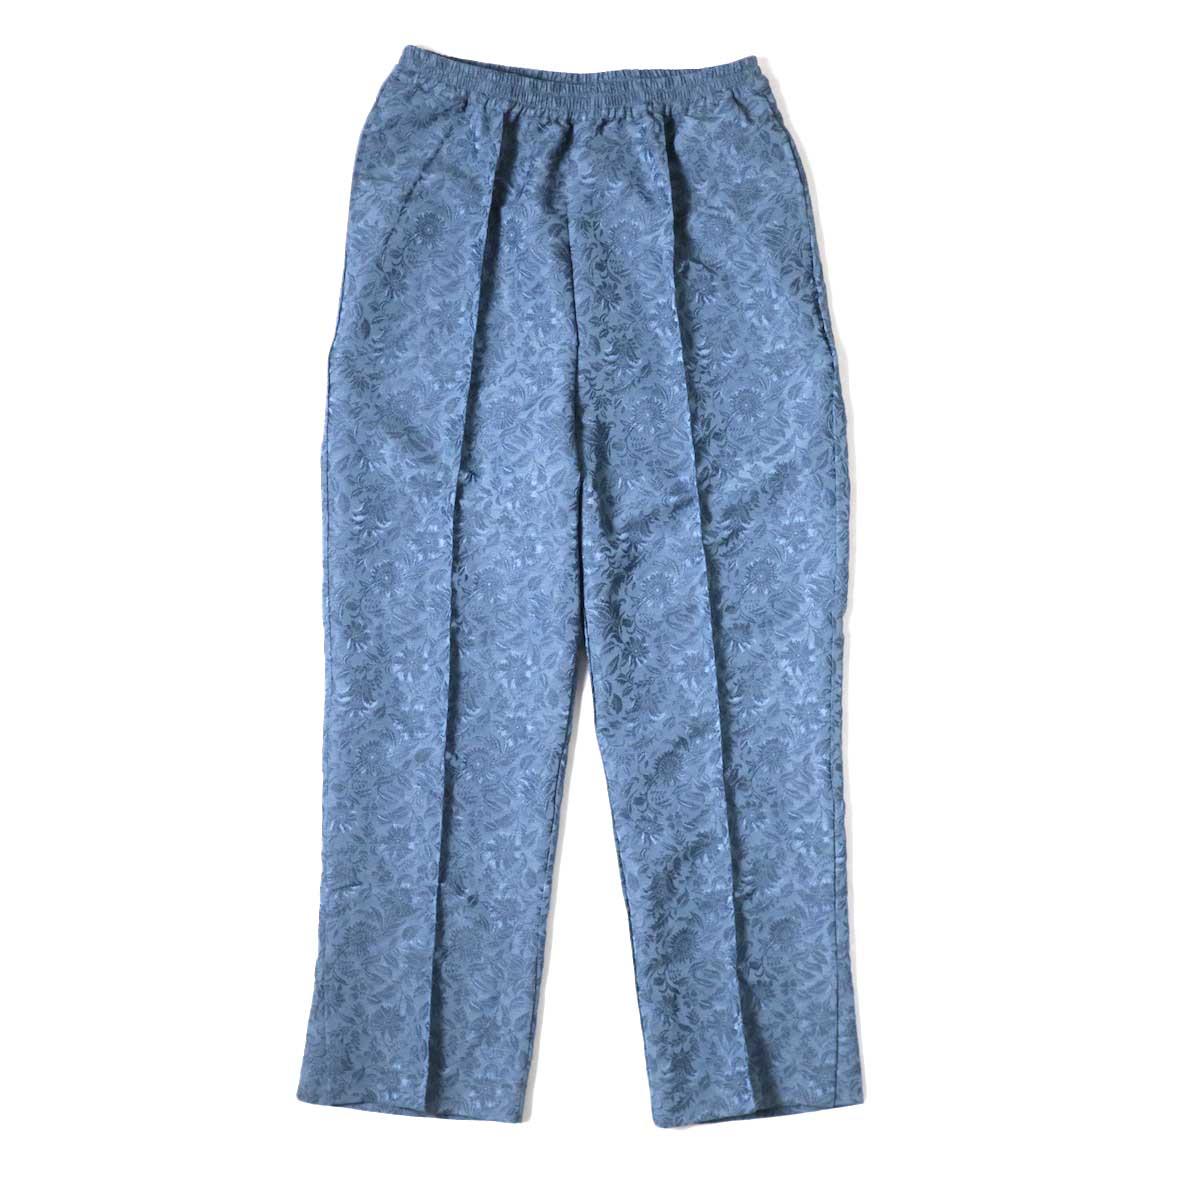 KHA:KI / JAQUARD PANTS (VintageBlue)